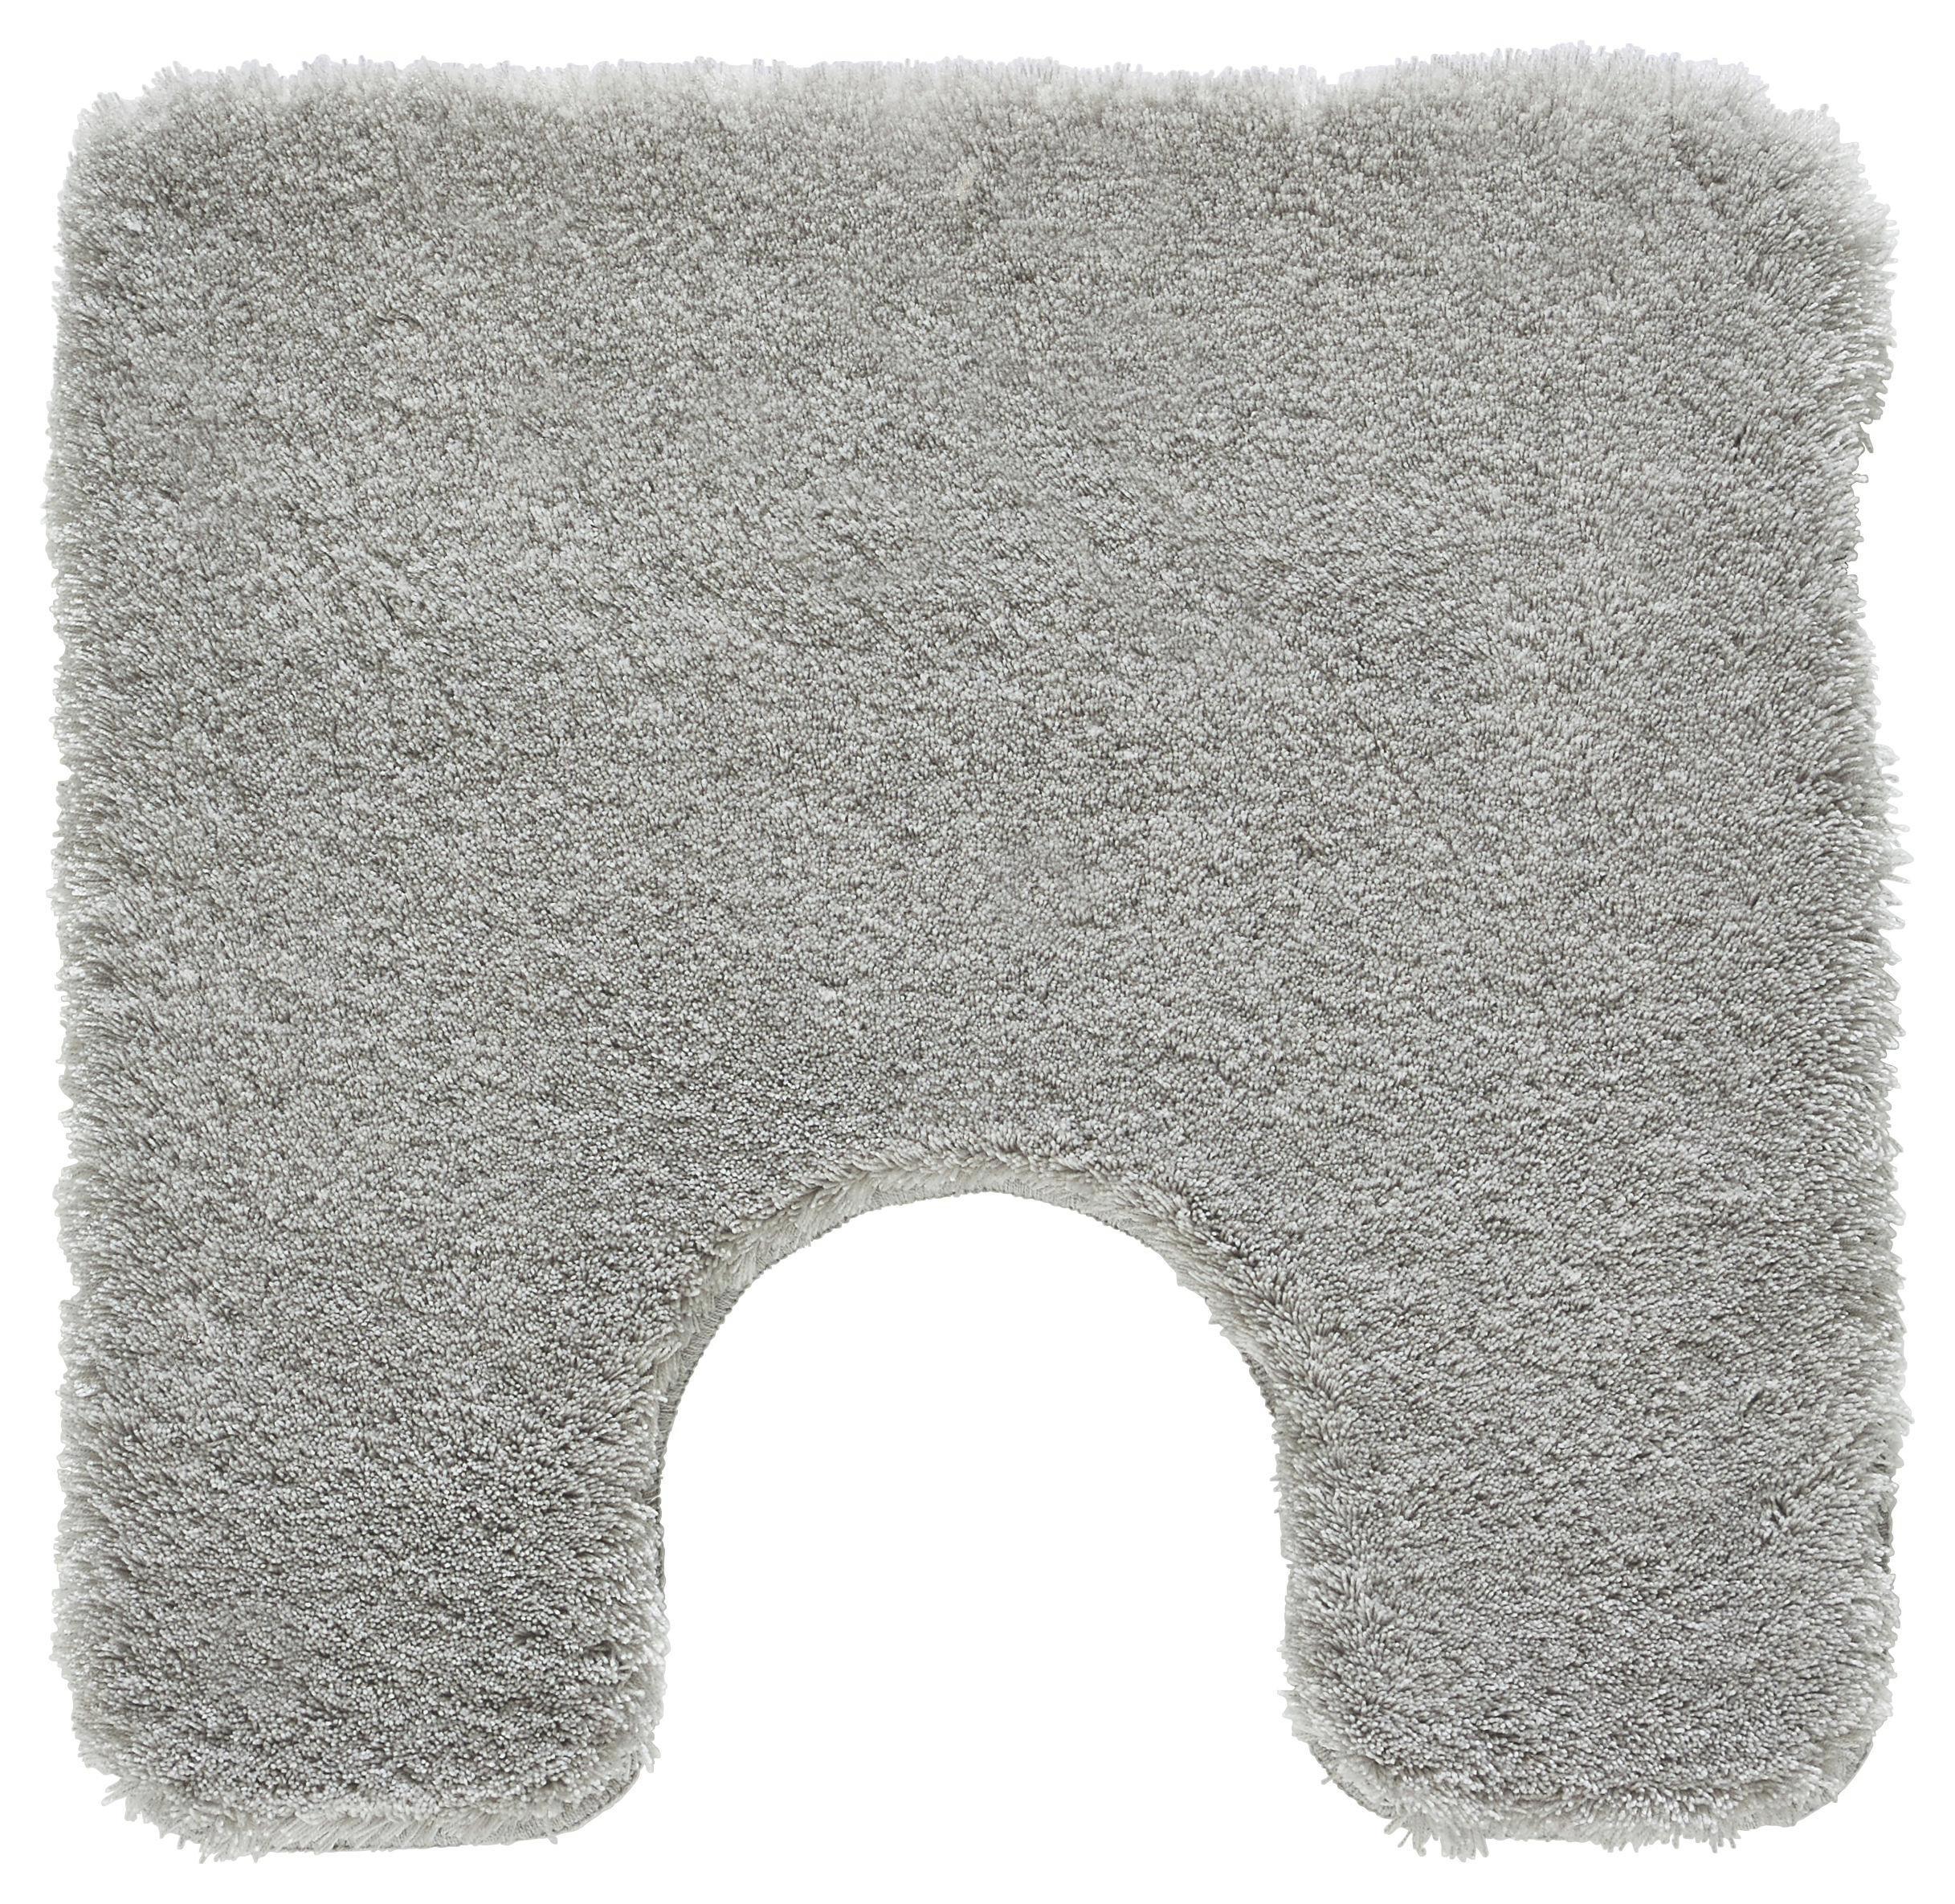 WC-VORLEGER  Grau  55/55 cm - Grau, Basics, Kunststoff/Textil (55/55cm) - KLEINE WOLKE